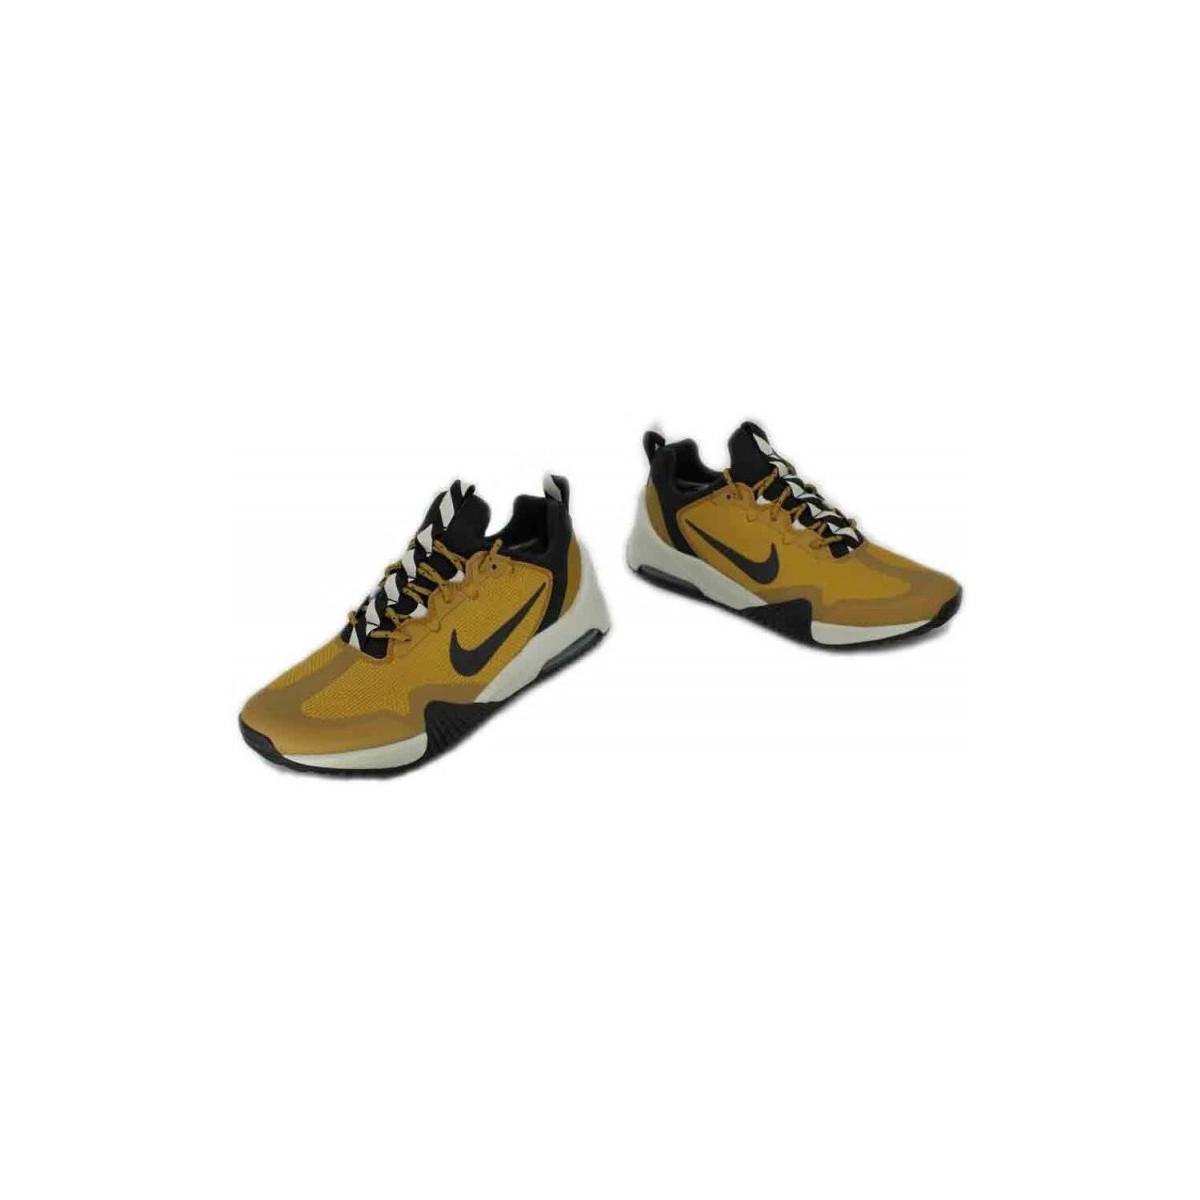 4417d18f98d Nike Air Max Grigora 916767 Men s Sneakers Men s Shoes (trainers) In ...